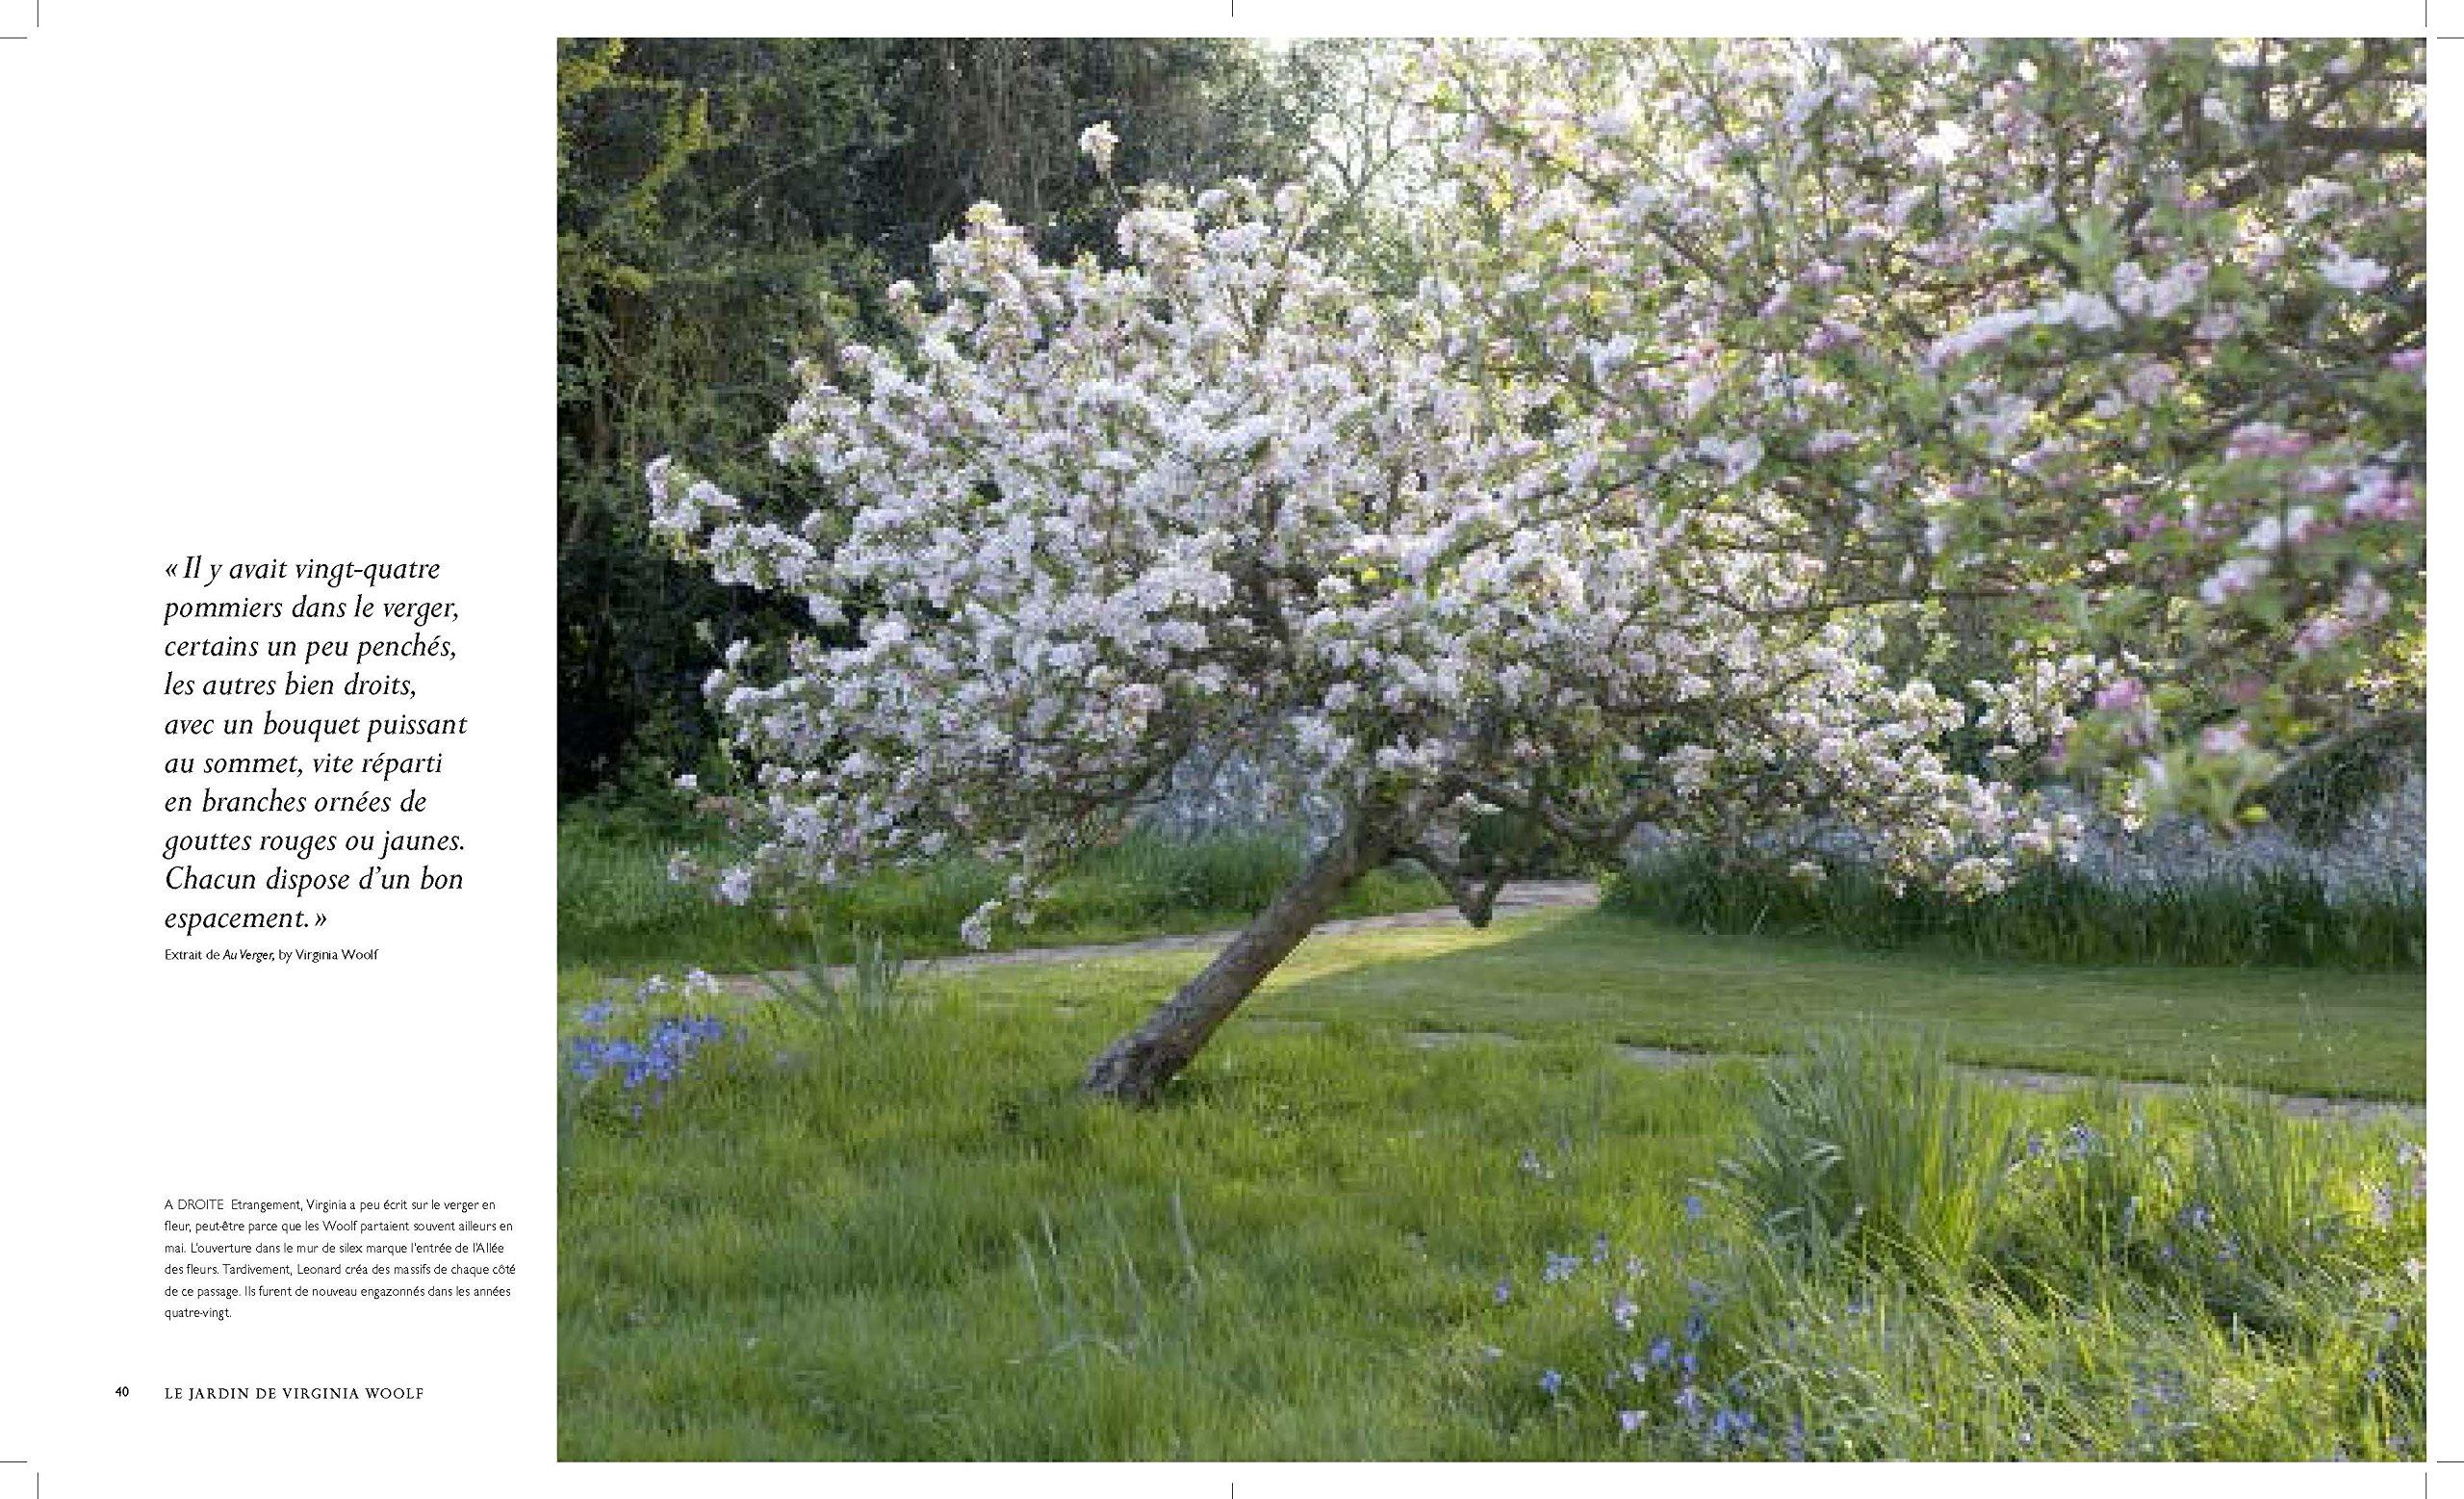 Le jardin de virginia woolf histoire du jardin de monk s house